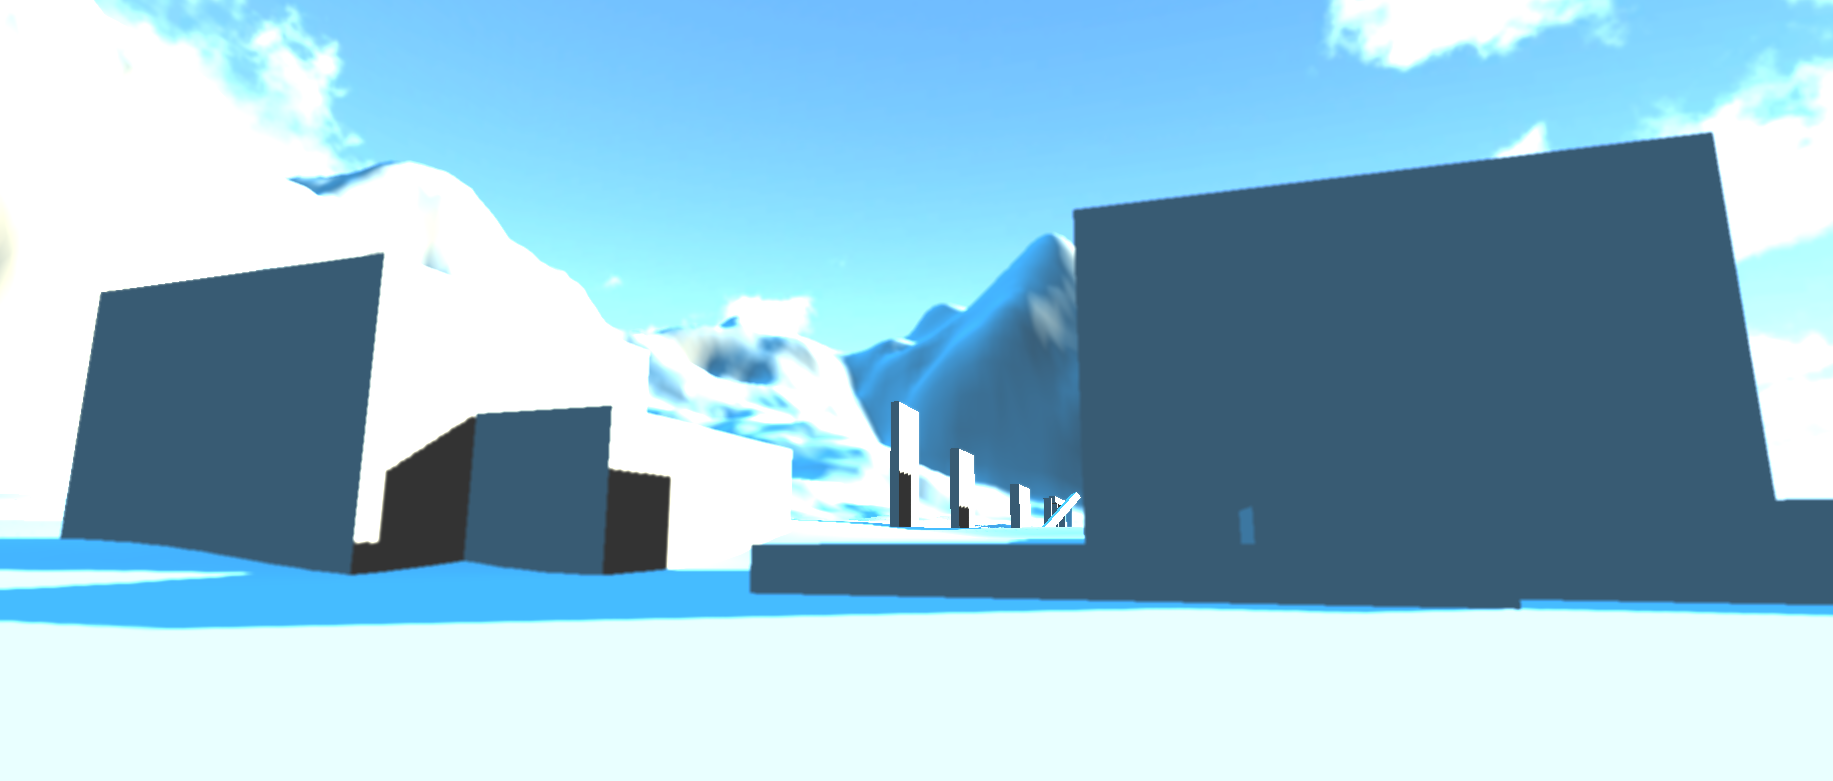 Dreamlike scenes using Unity Pro shaders